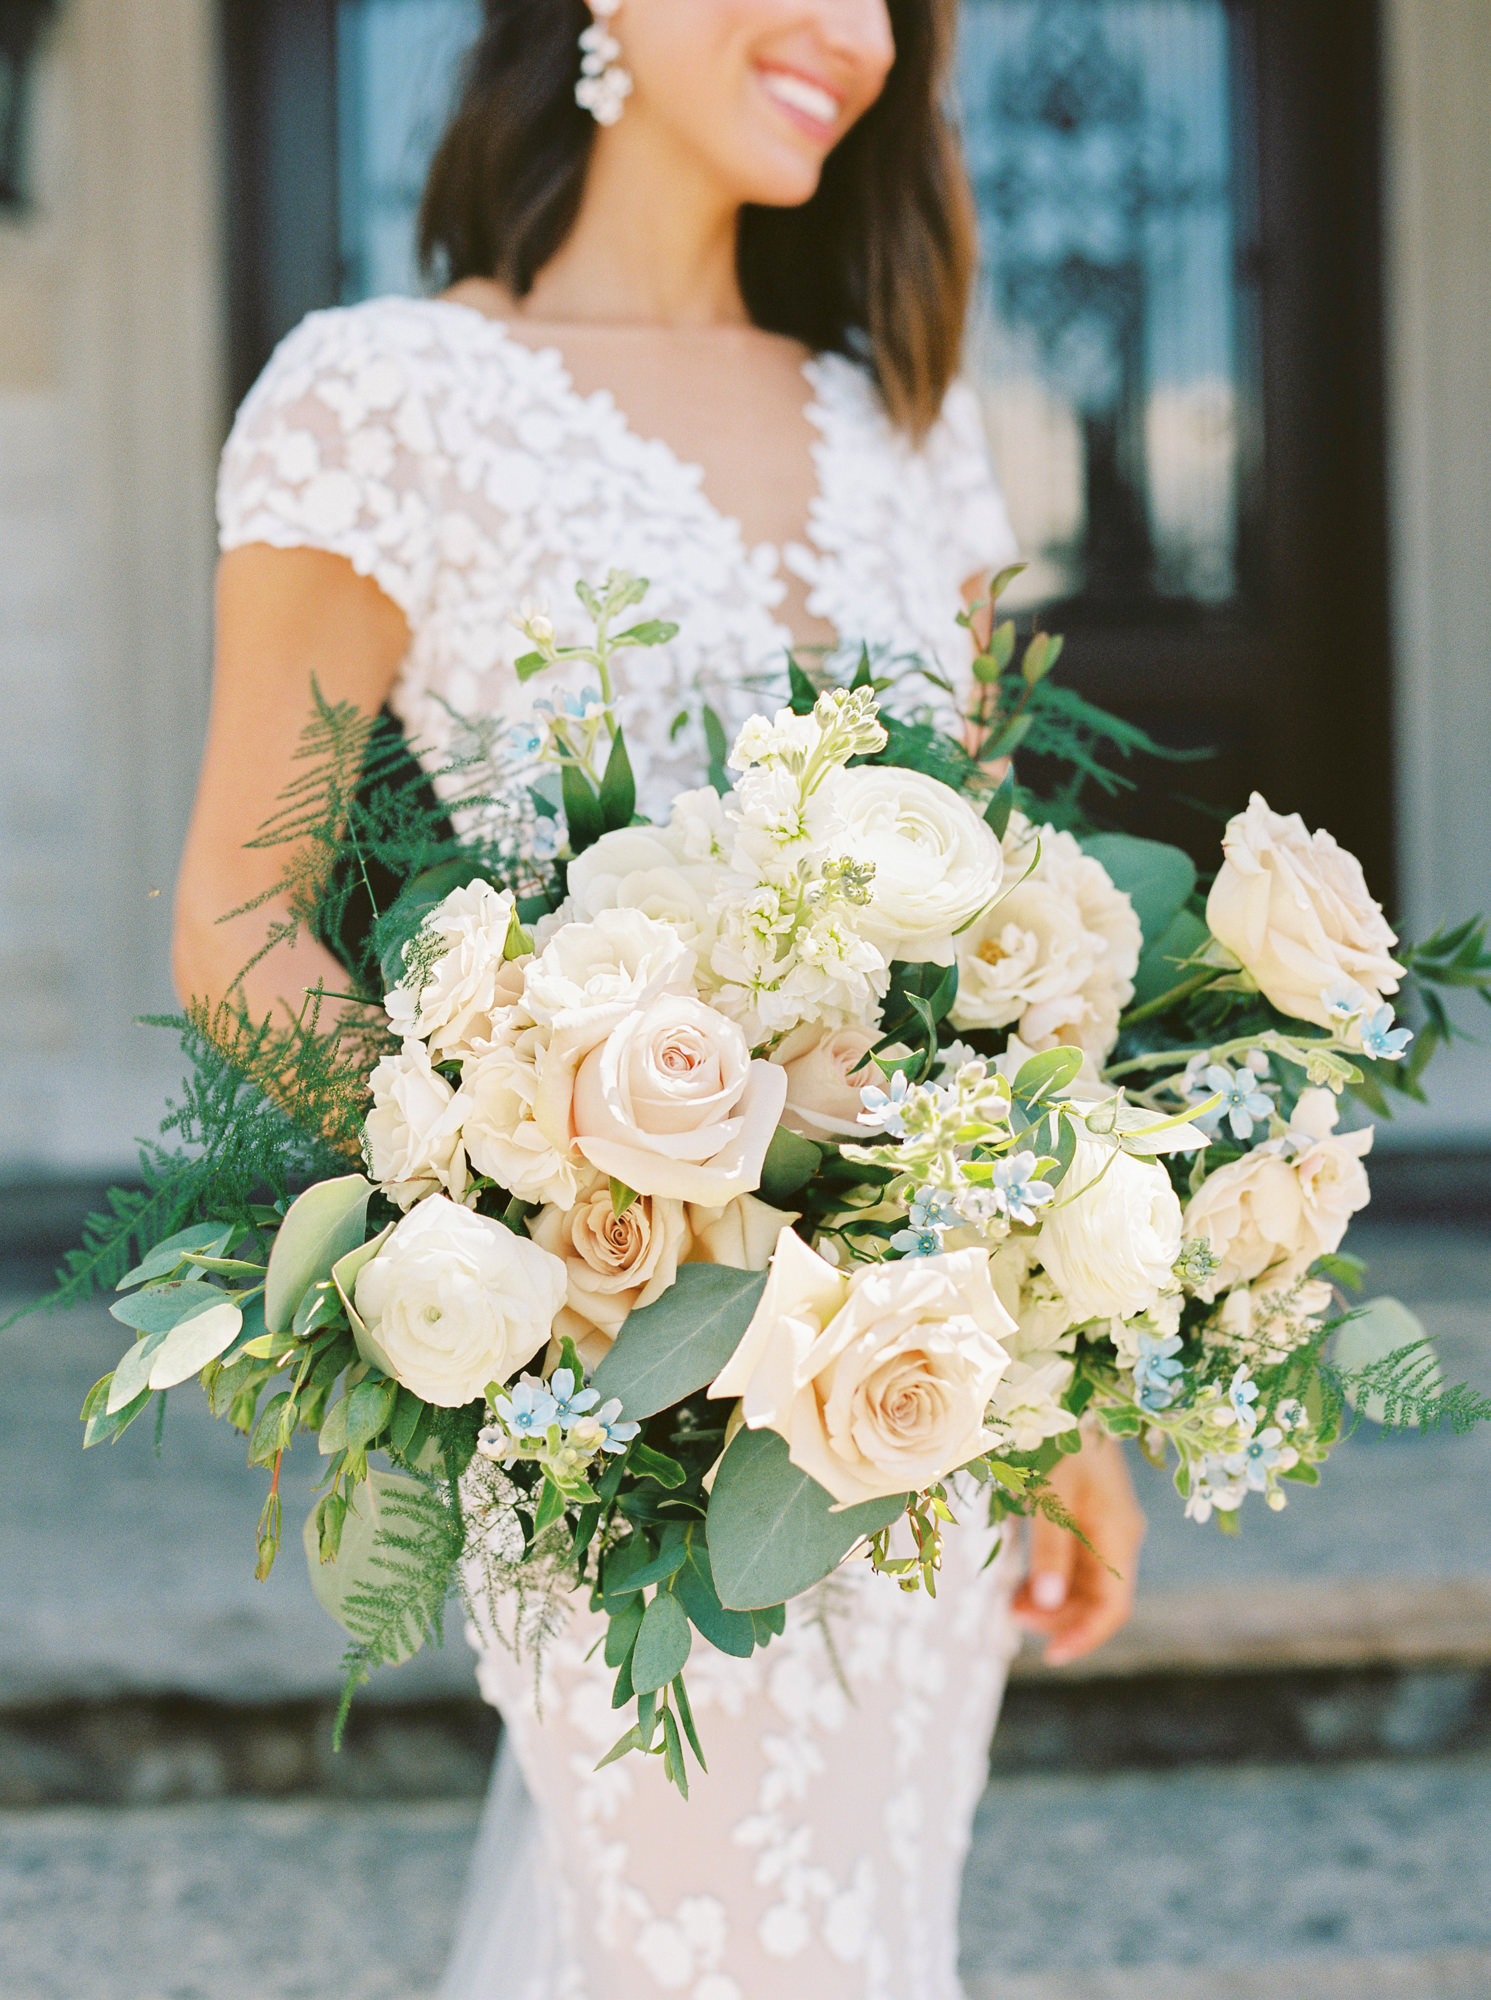 roses, ranunculus, blue tweedia, and greenery bridal wedding bouquet